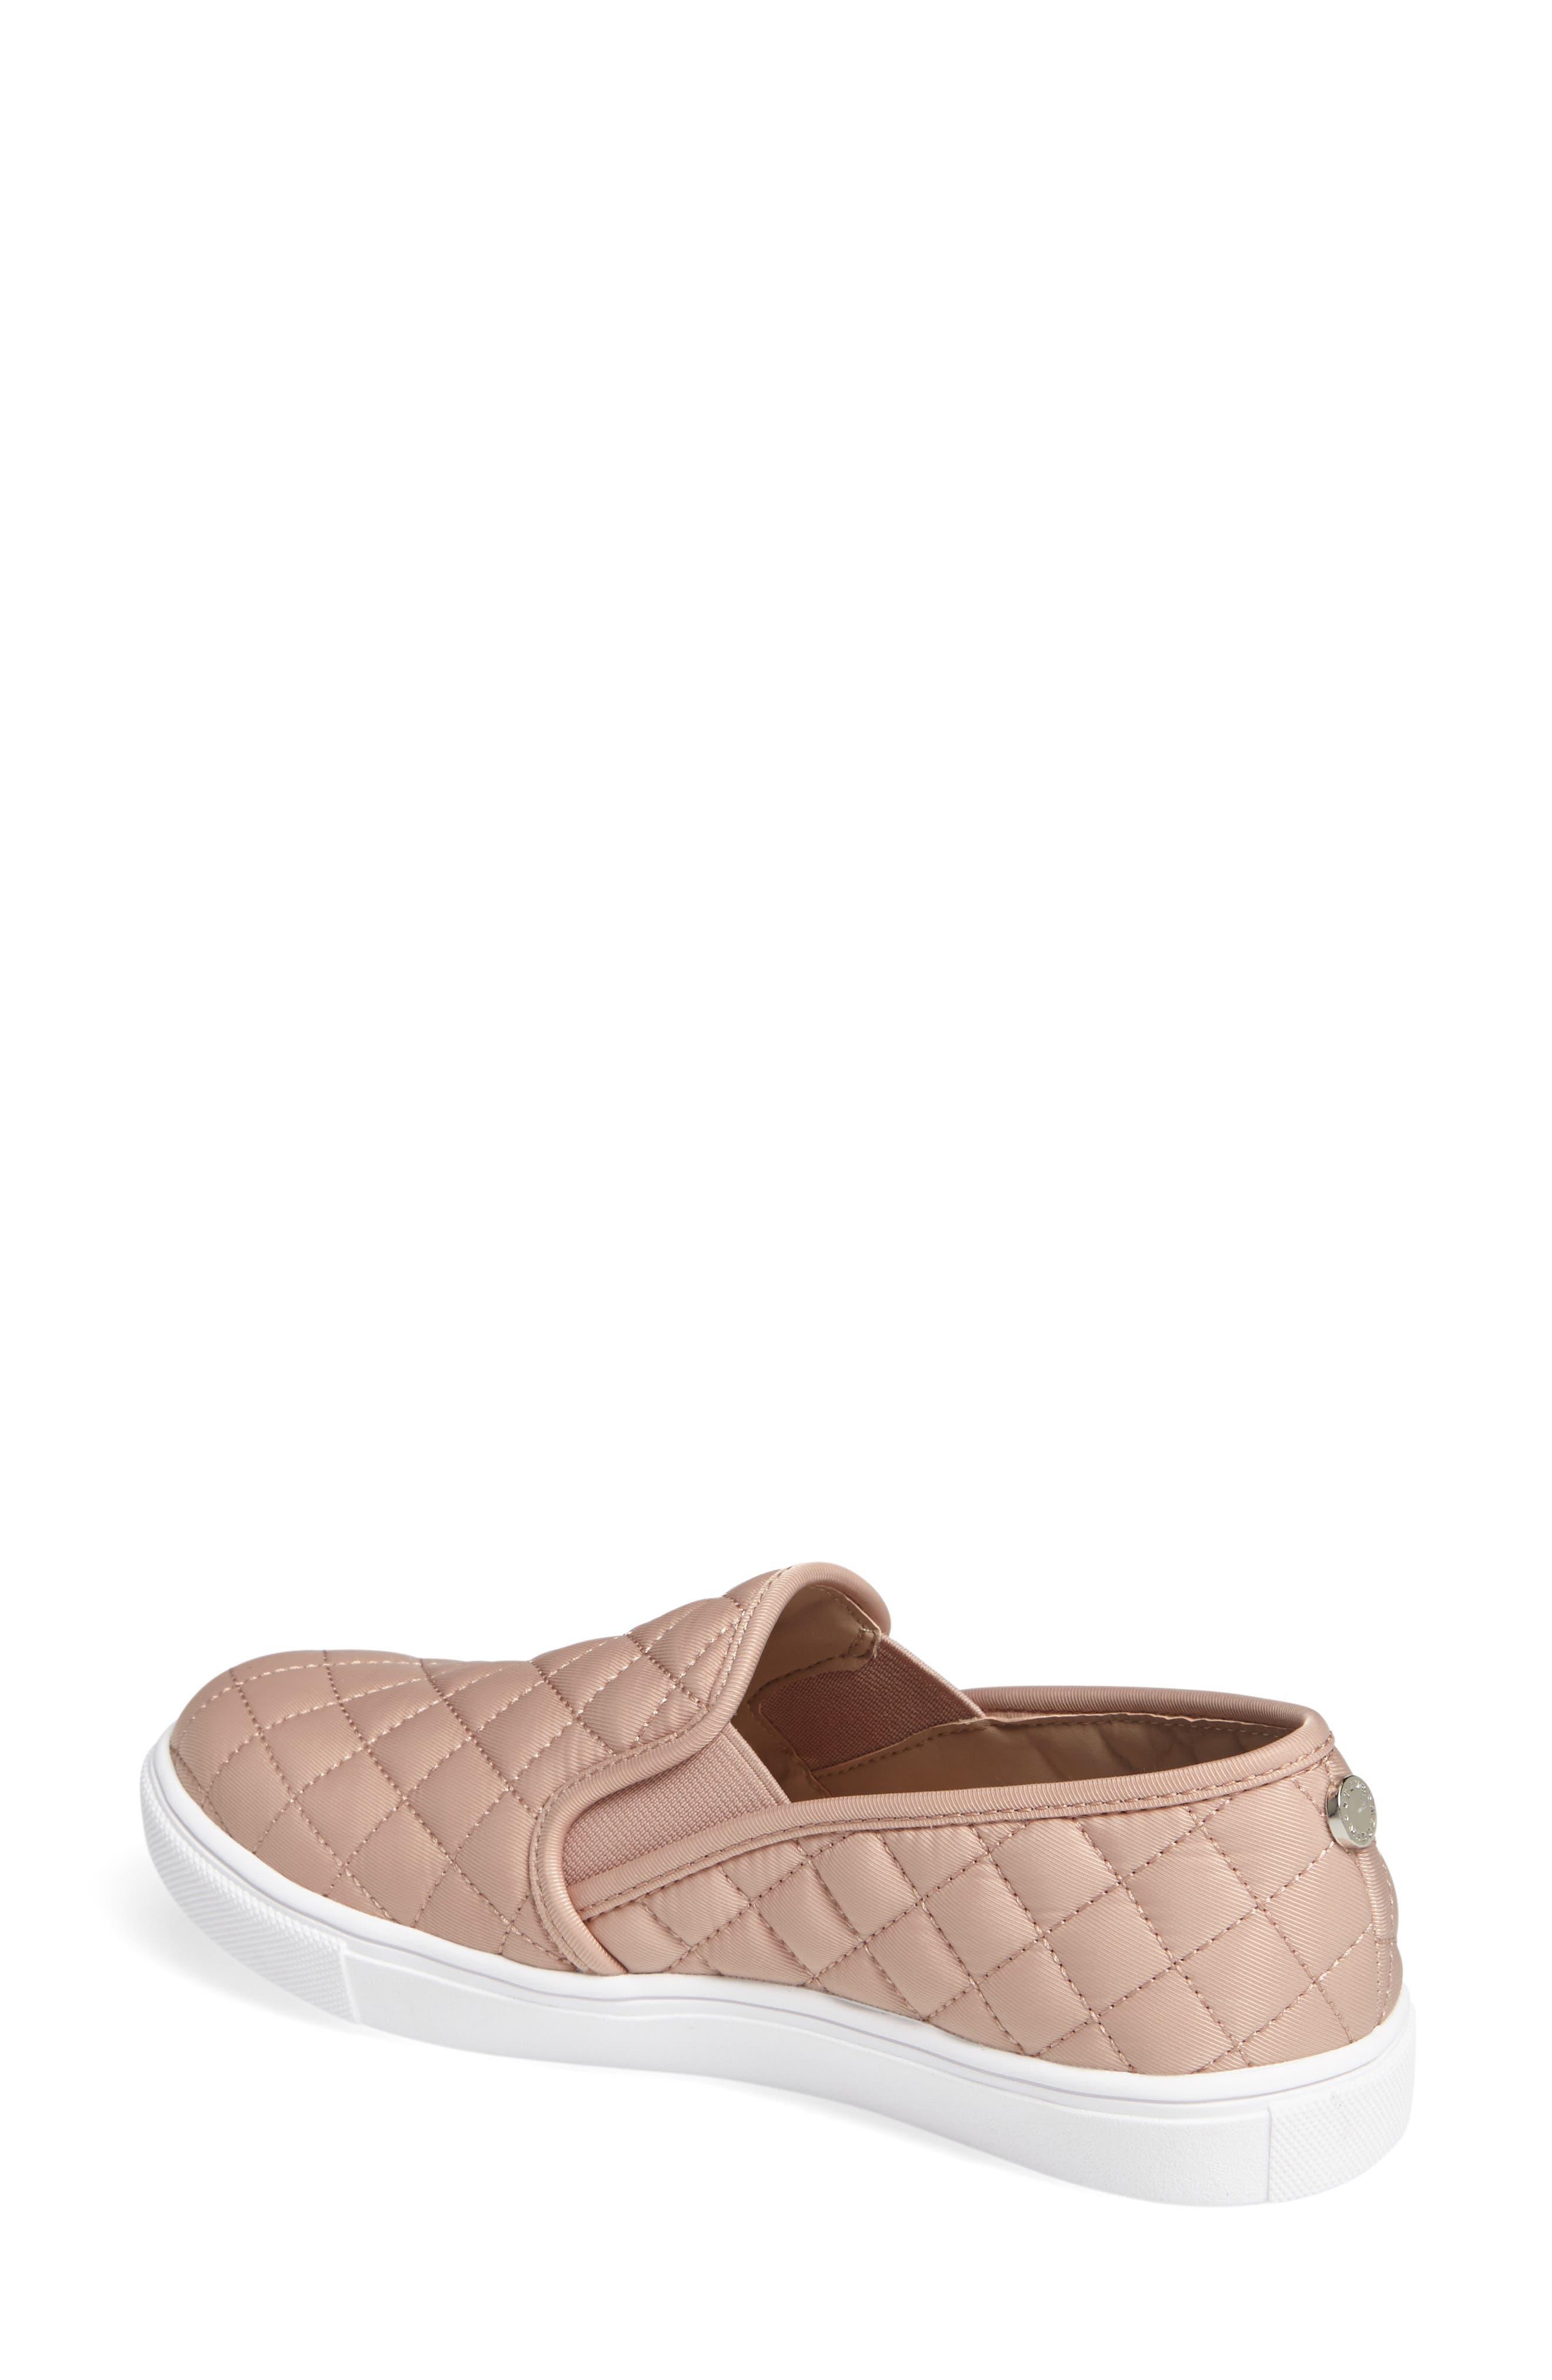 STEVE MADDEN, 'Ecntrcqt' Sneaker, Alternate thumbnail 2, color, BLUSH FABRIC